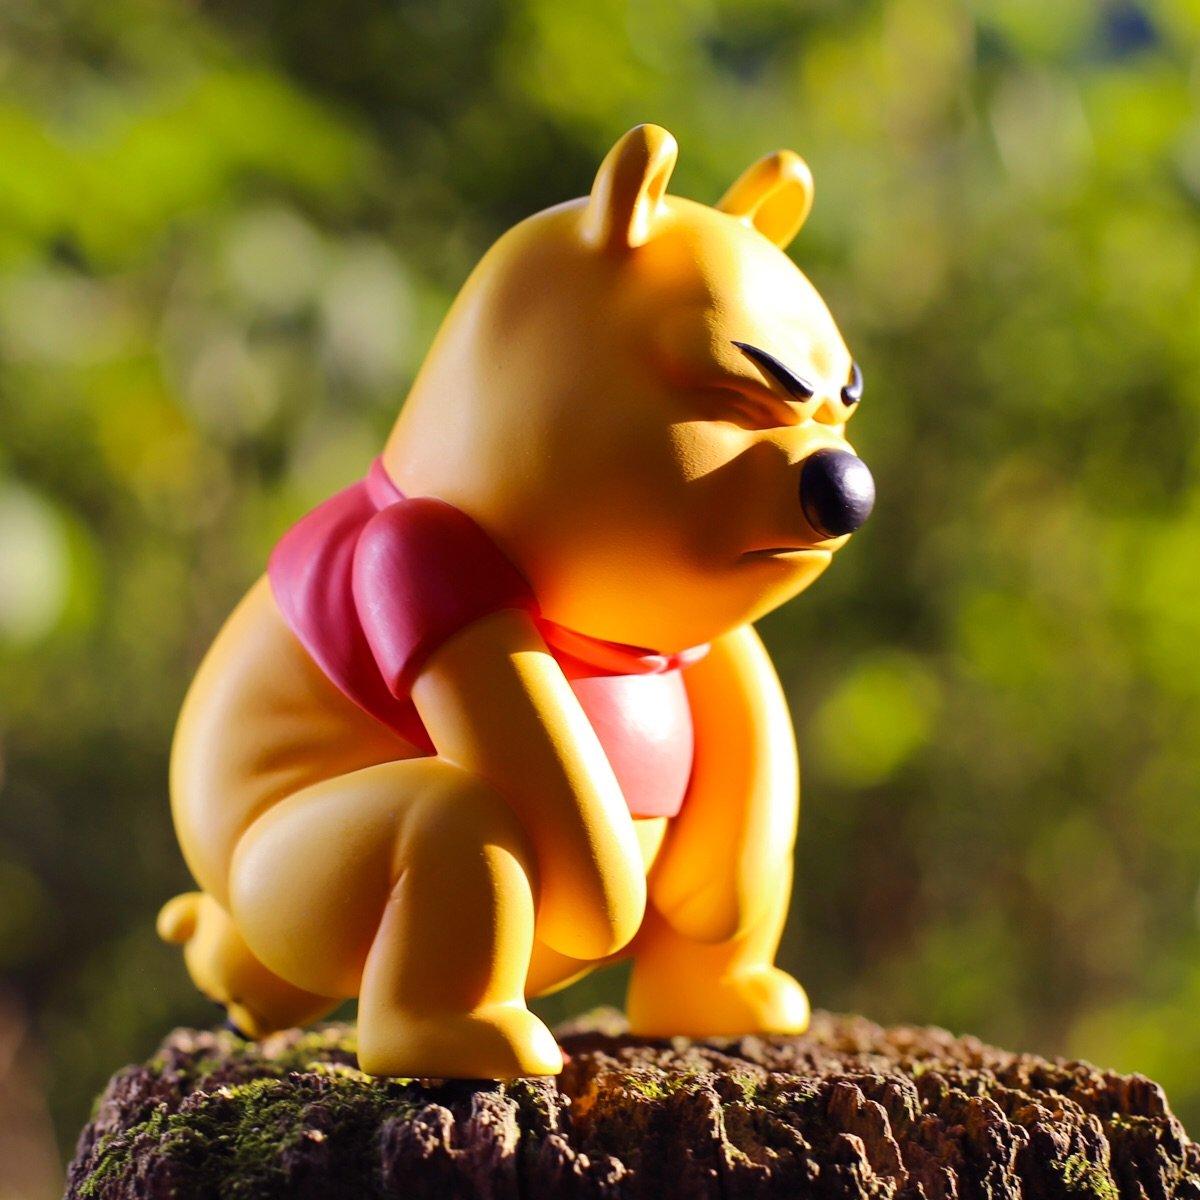 Winnie The Pooh Pooh By Alex Solis